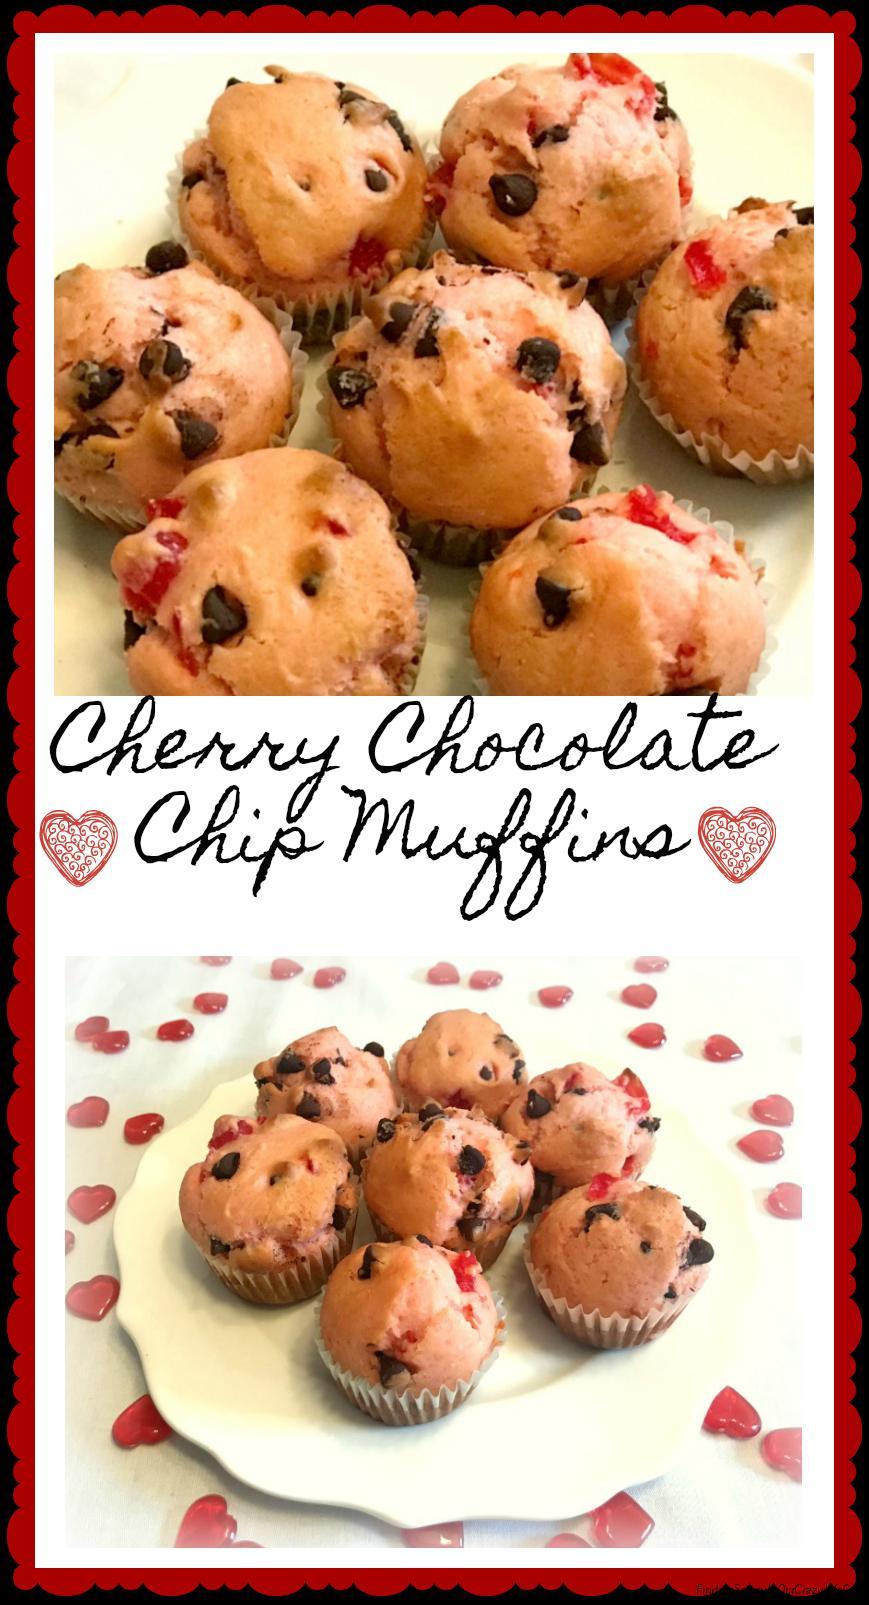 Cherry Chocolate Chip Muffins #ValentinesSweets